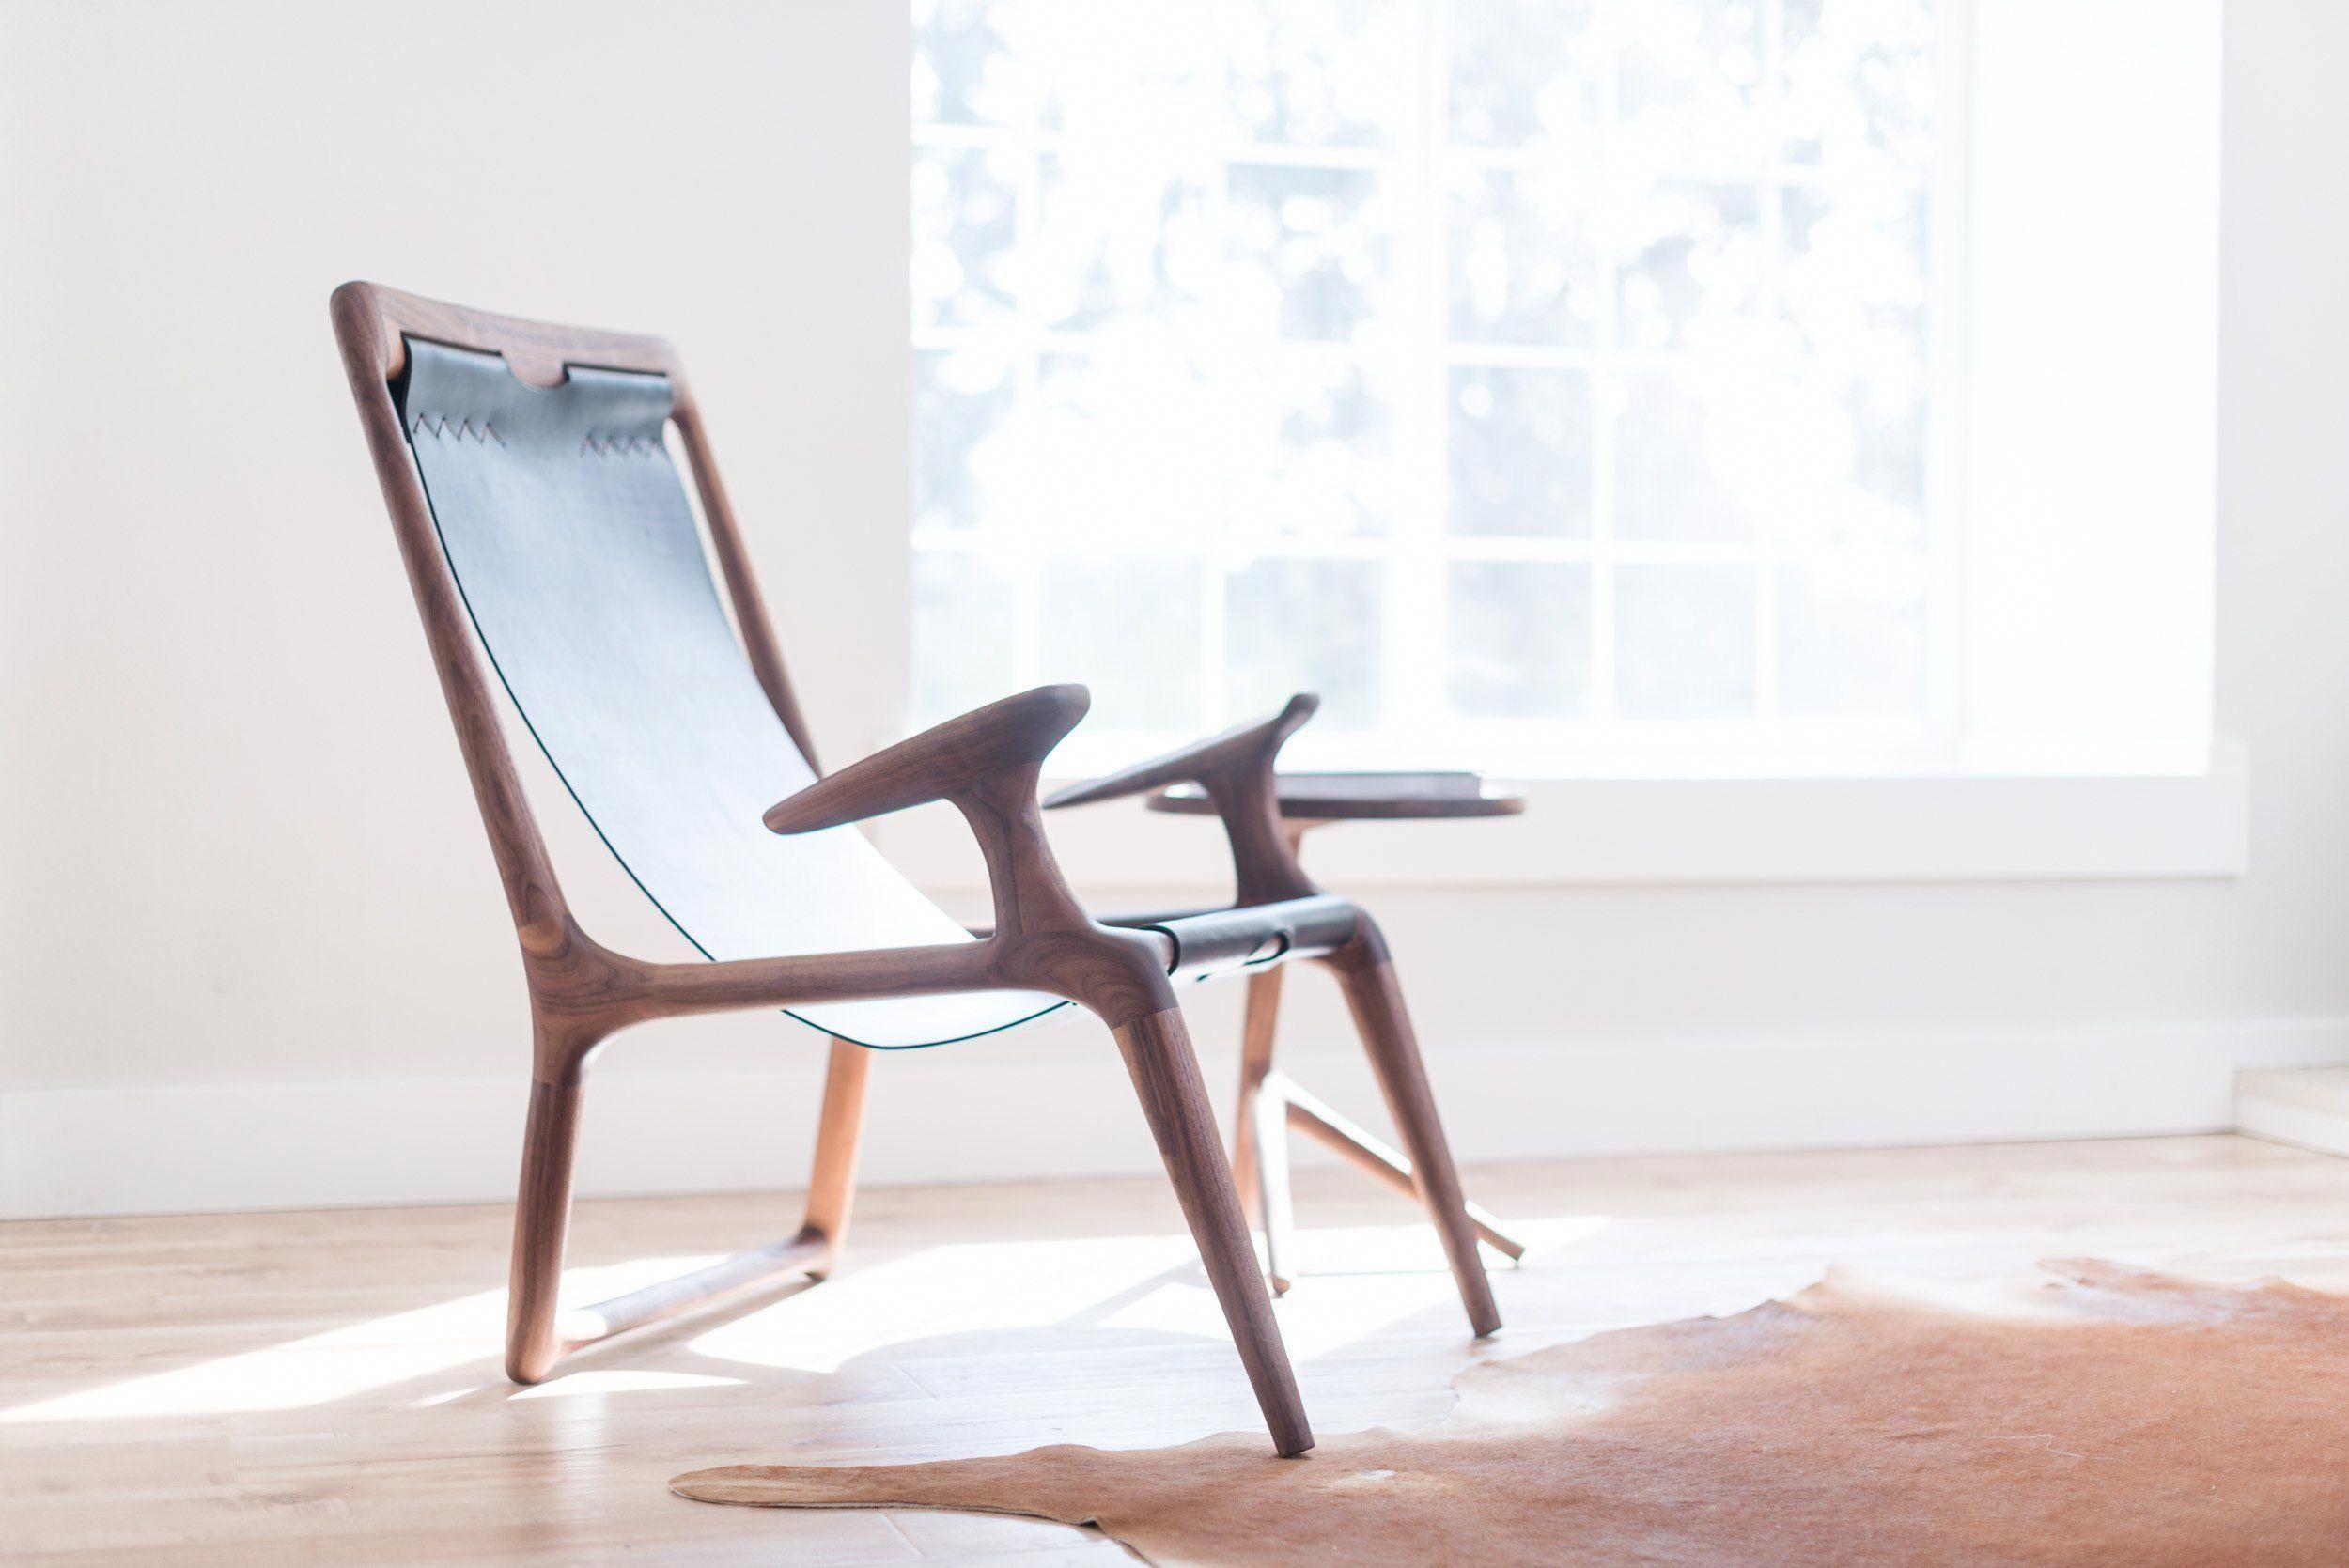 The sling chair walnut u black leather chairsforrentnearme